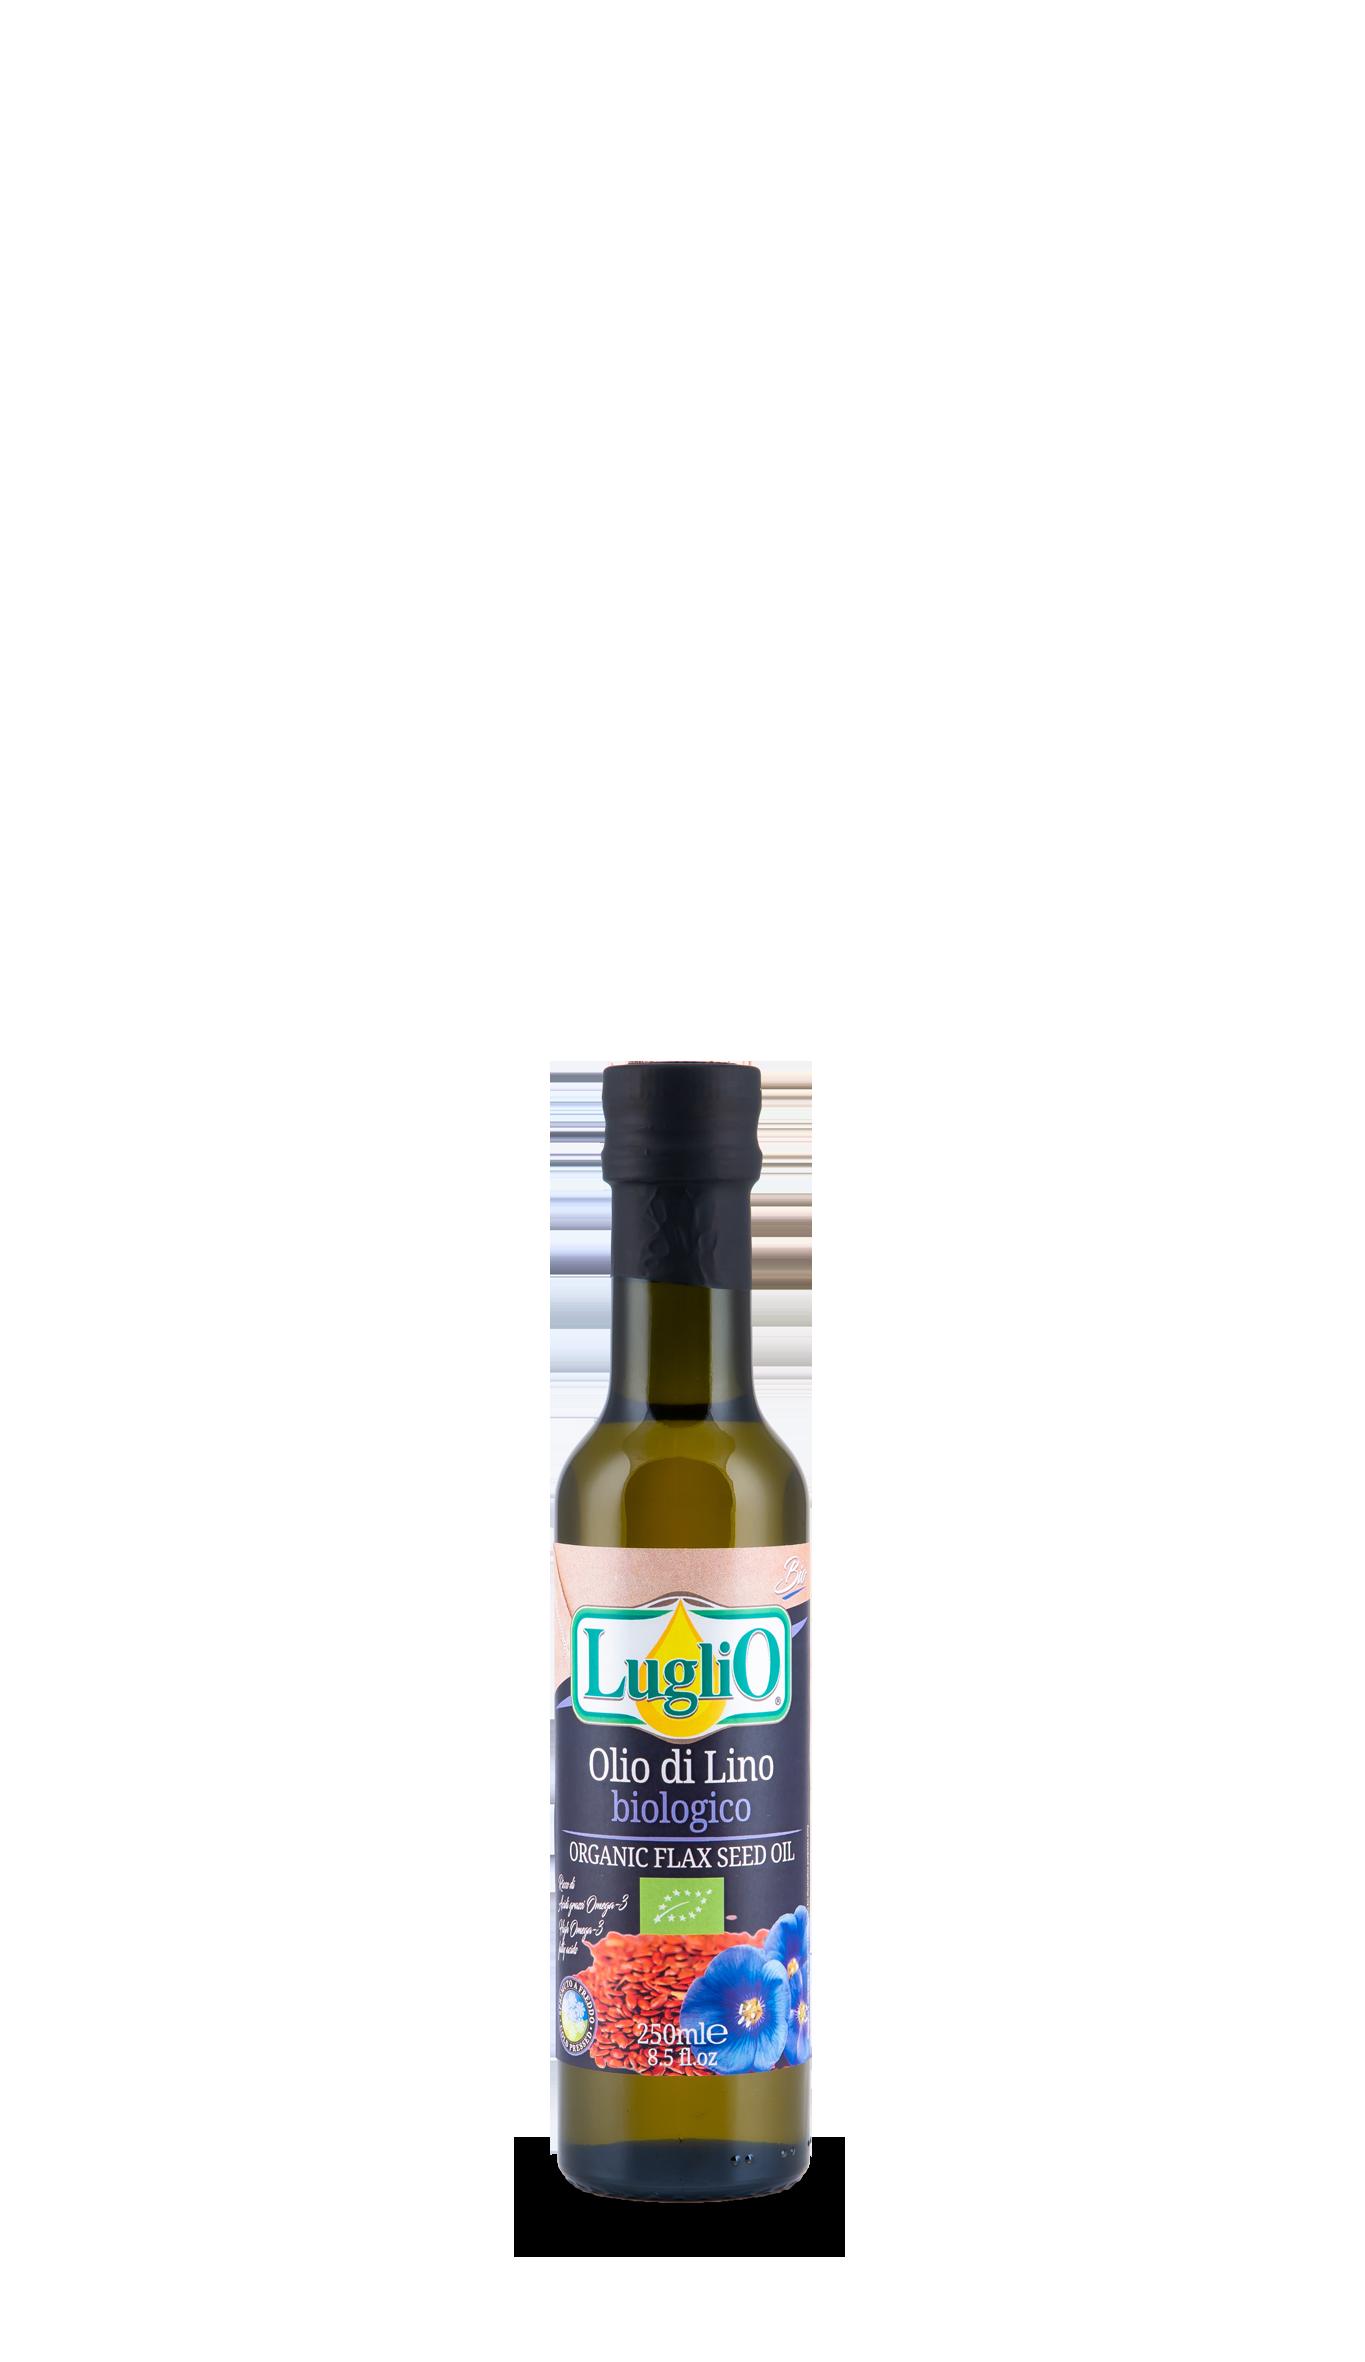 olio di lino 250 ml olio luglio